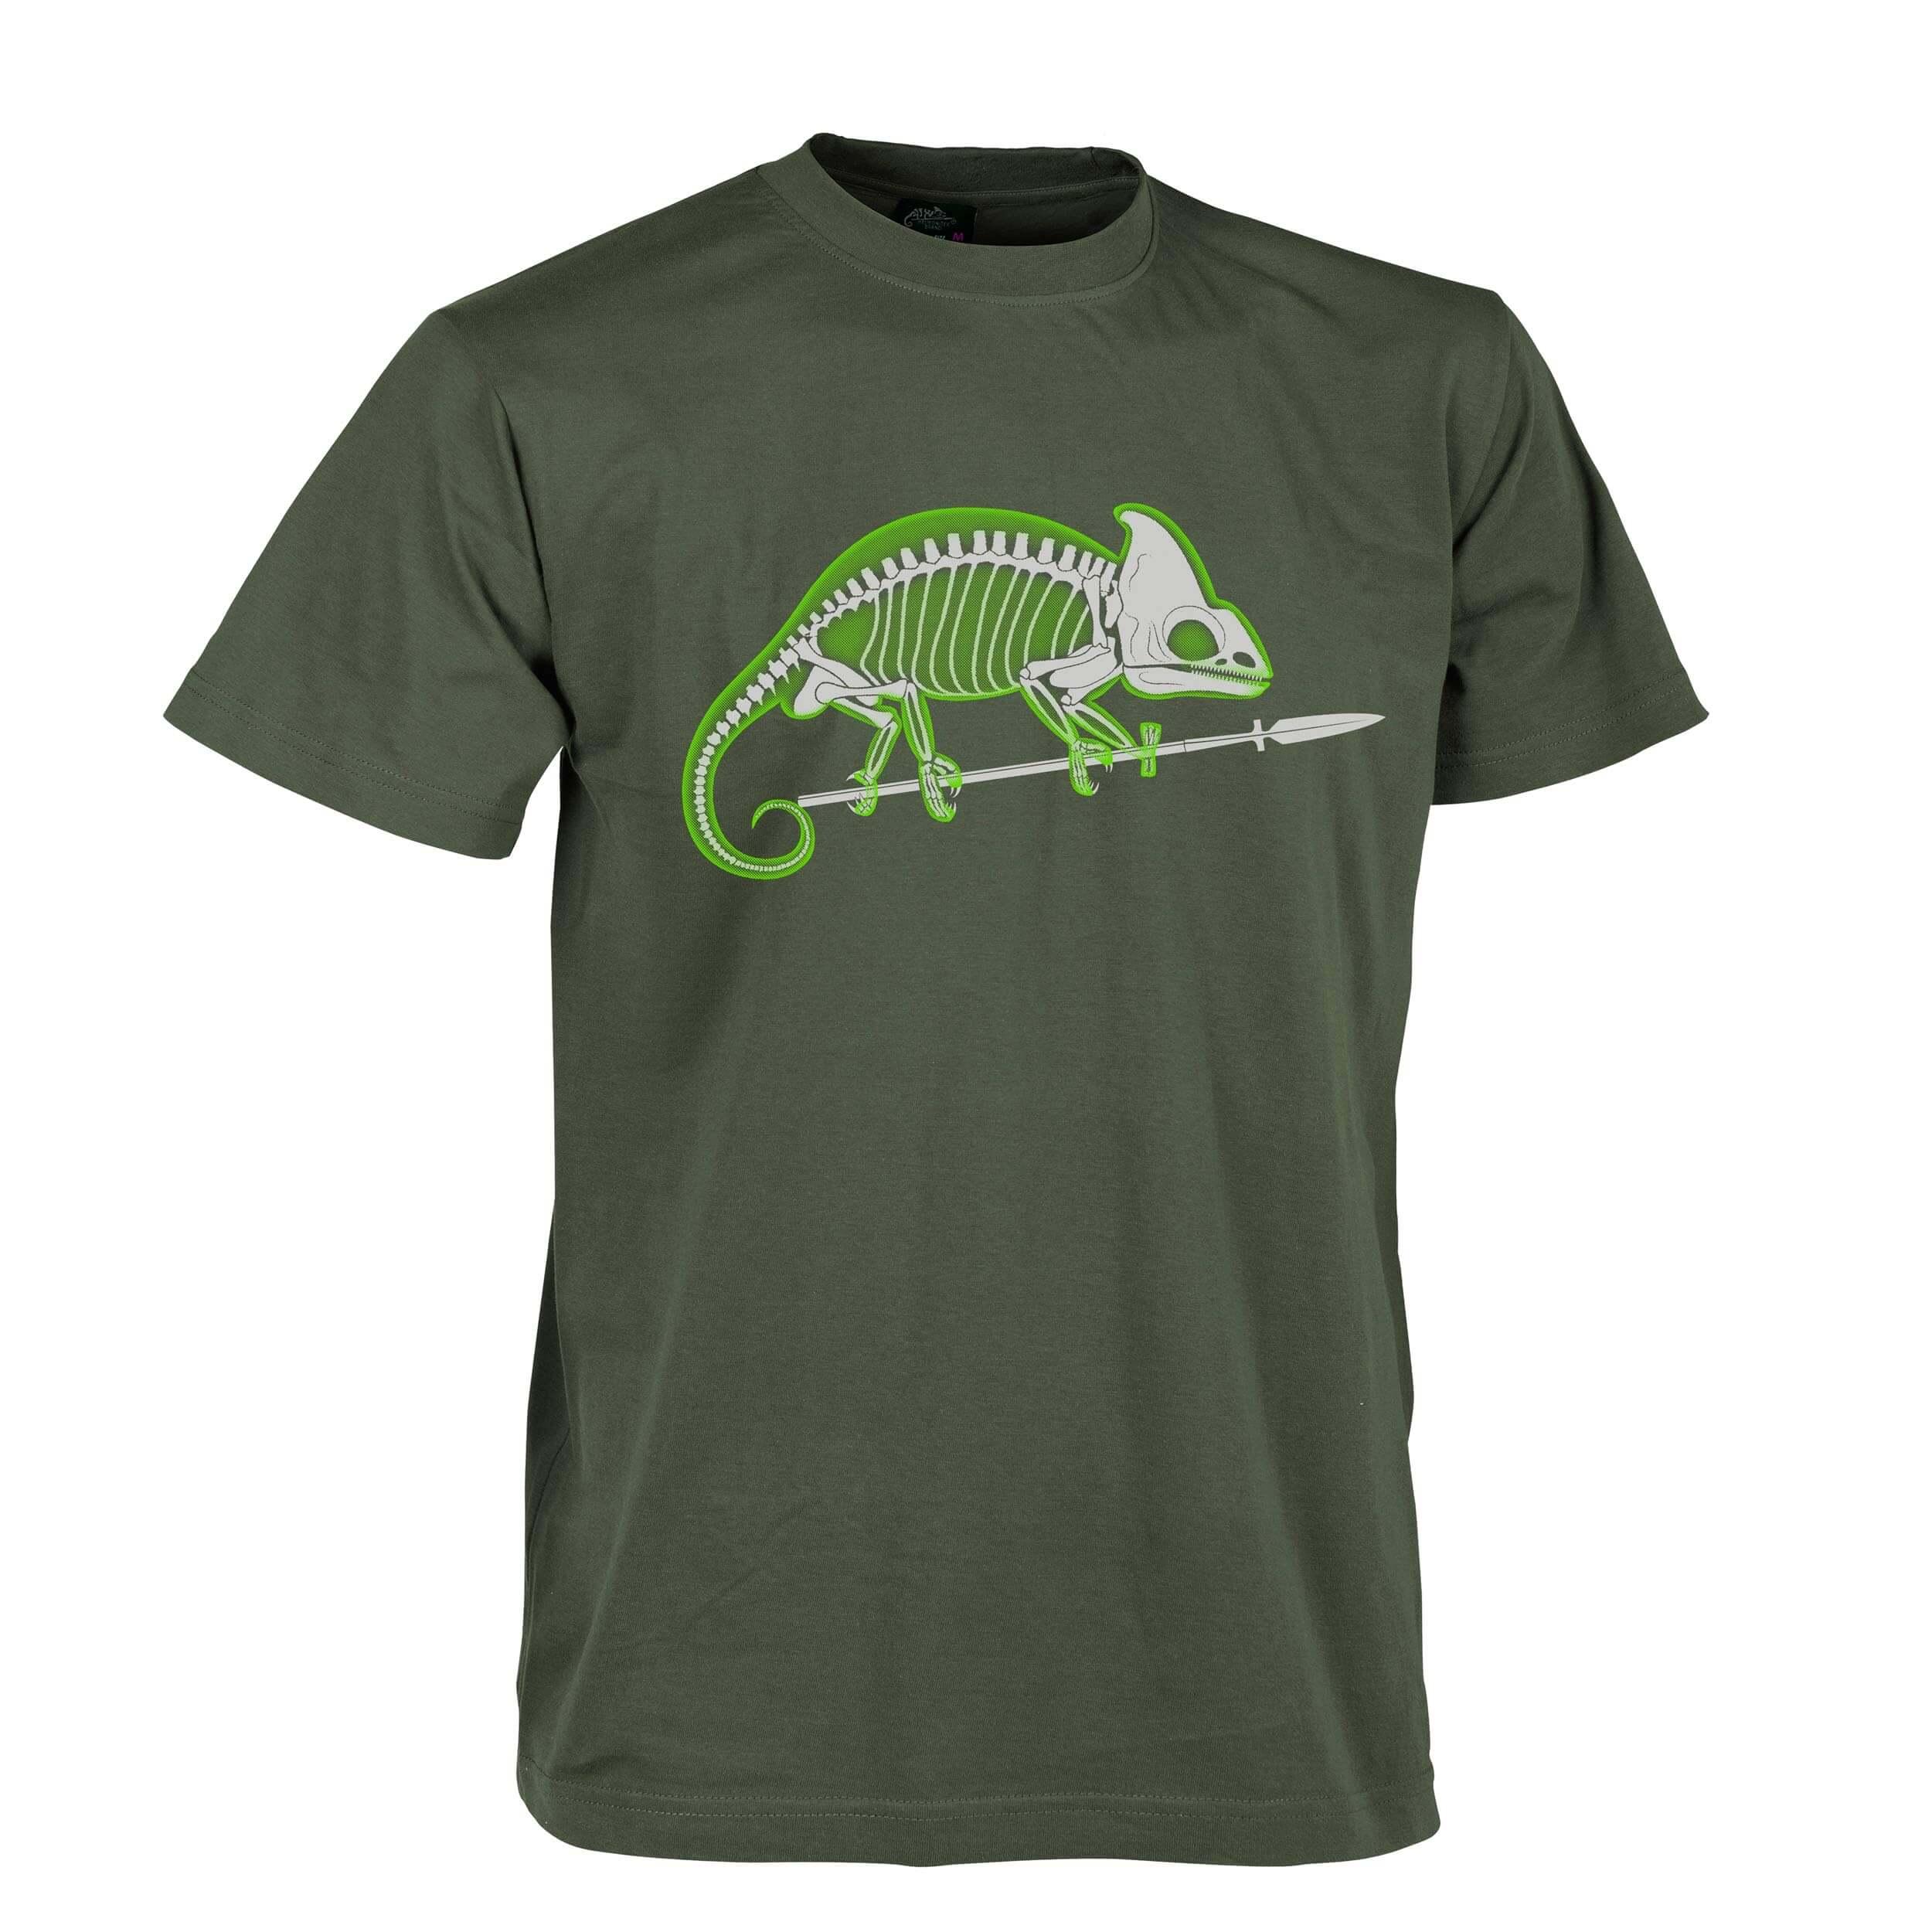 Helikon-Tex T-Shirt Chameleon Skeleton Olive Green